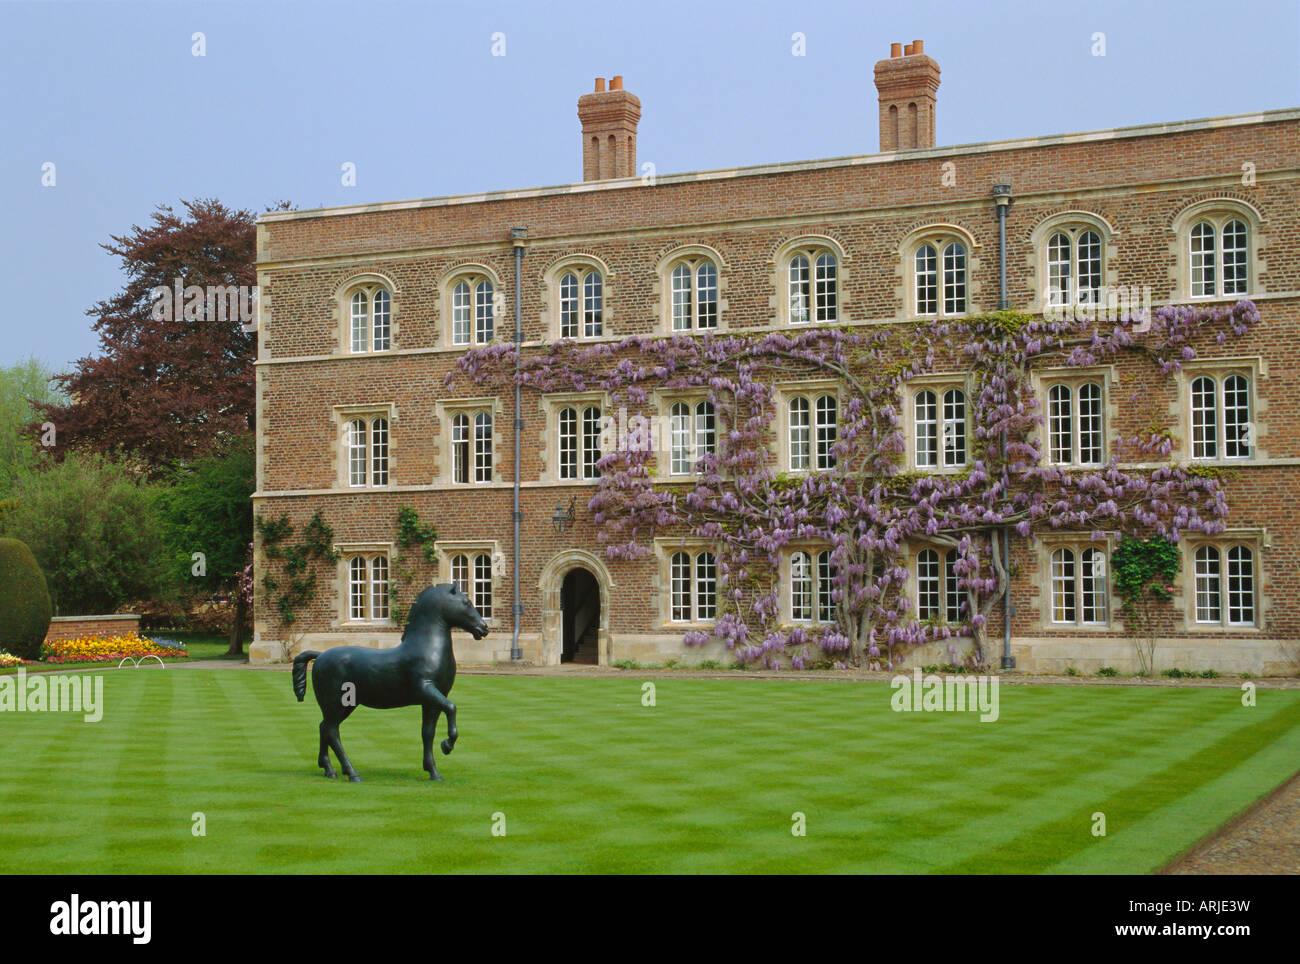 Jesus College, Cambridge, Cambridgeshire, England, UK - Stock Image